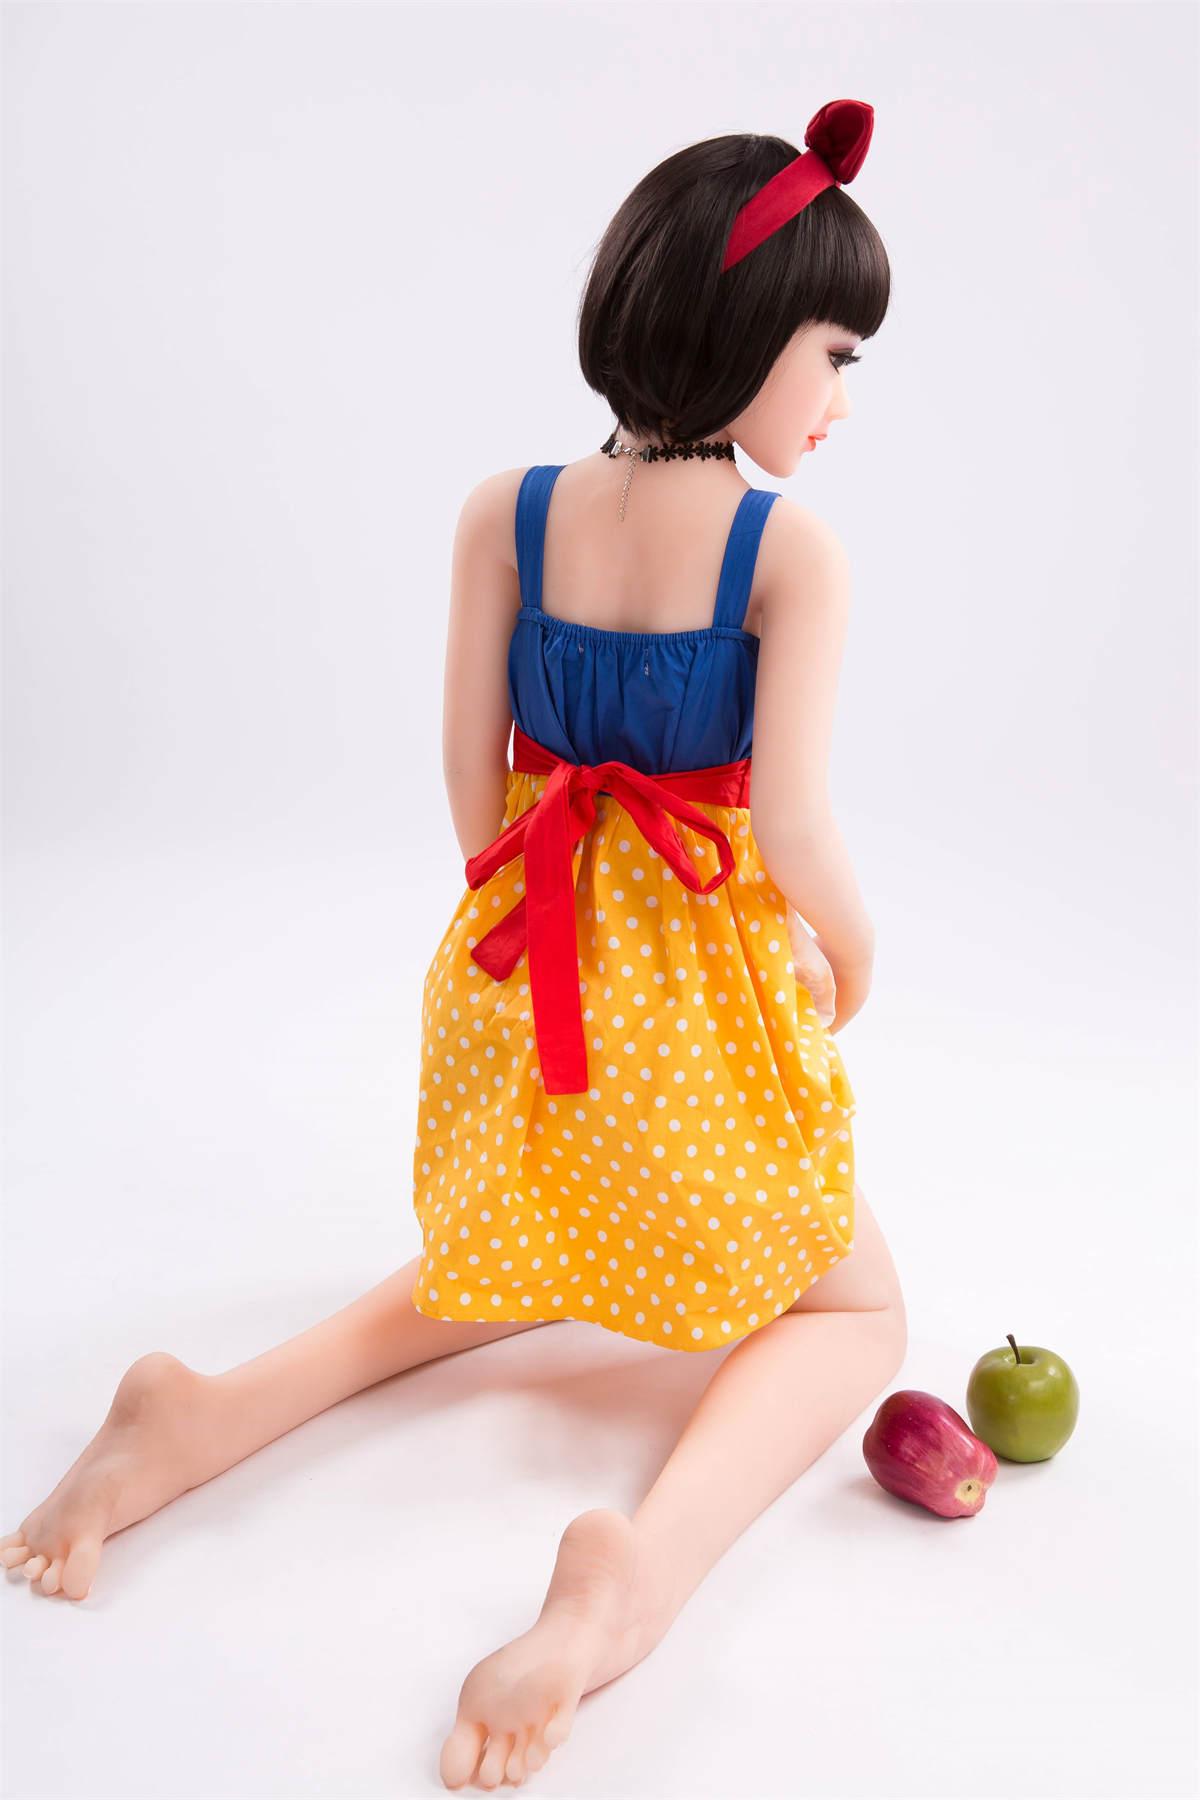 Scarlett-125cm Mini Real Silicone Sex Dolls Robot Realistic Vagina Anime Sexy Love Doll Skeleton Full Masturbator Adult Toys for Men (24)